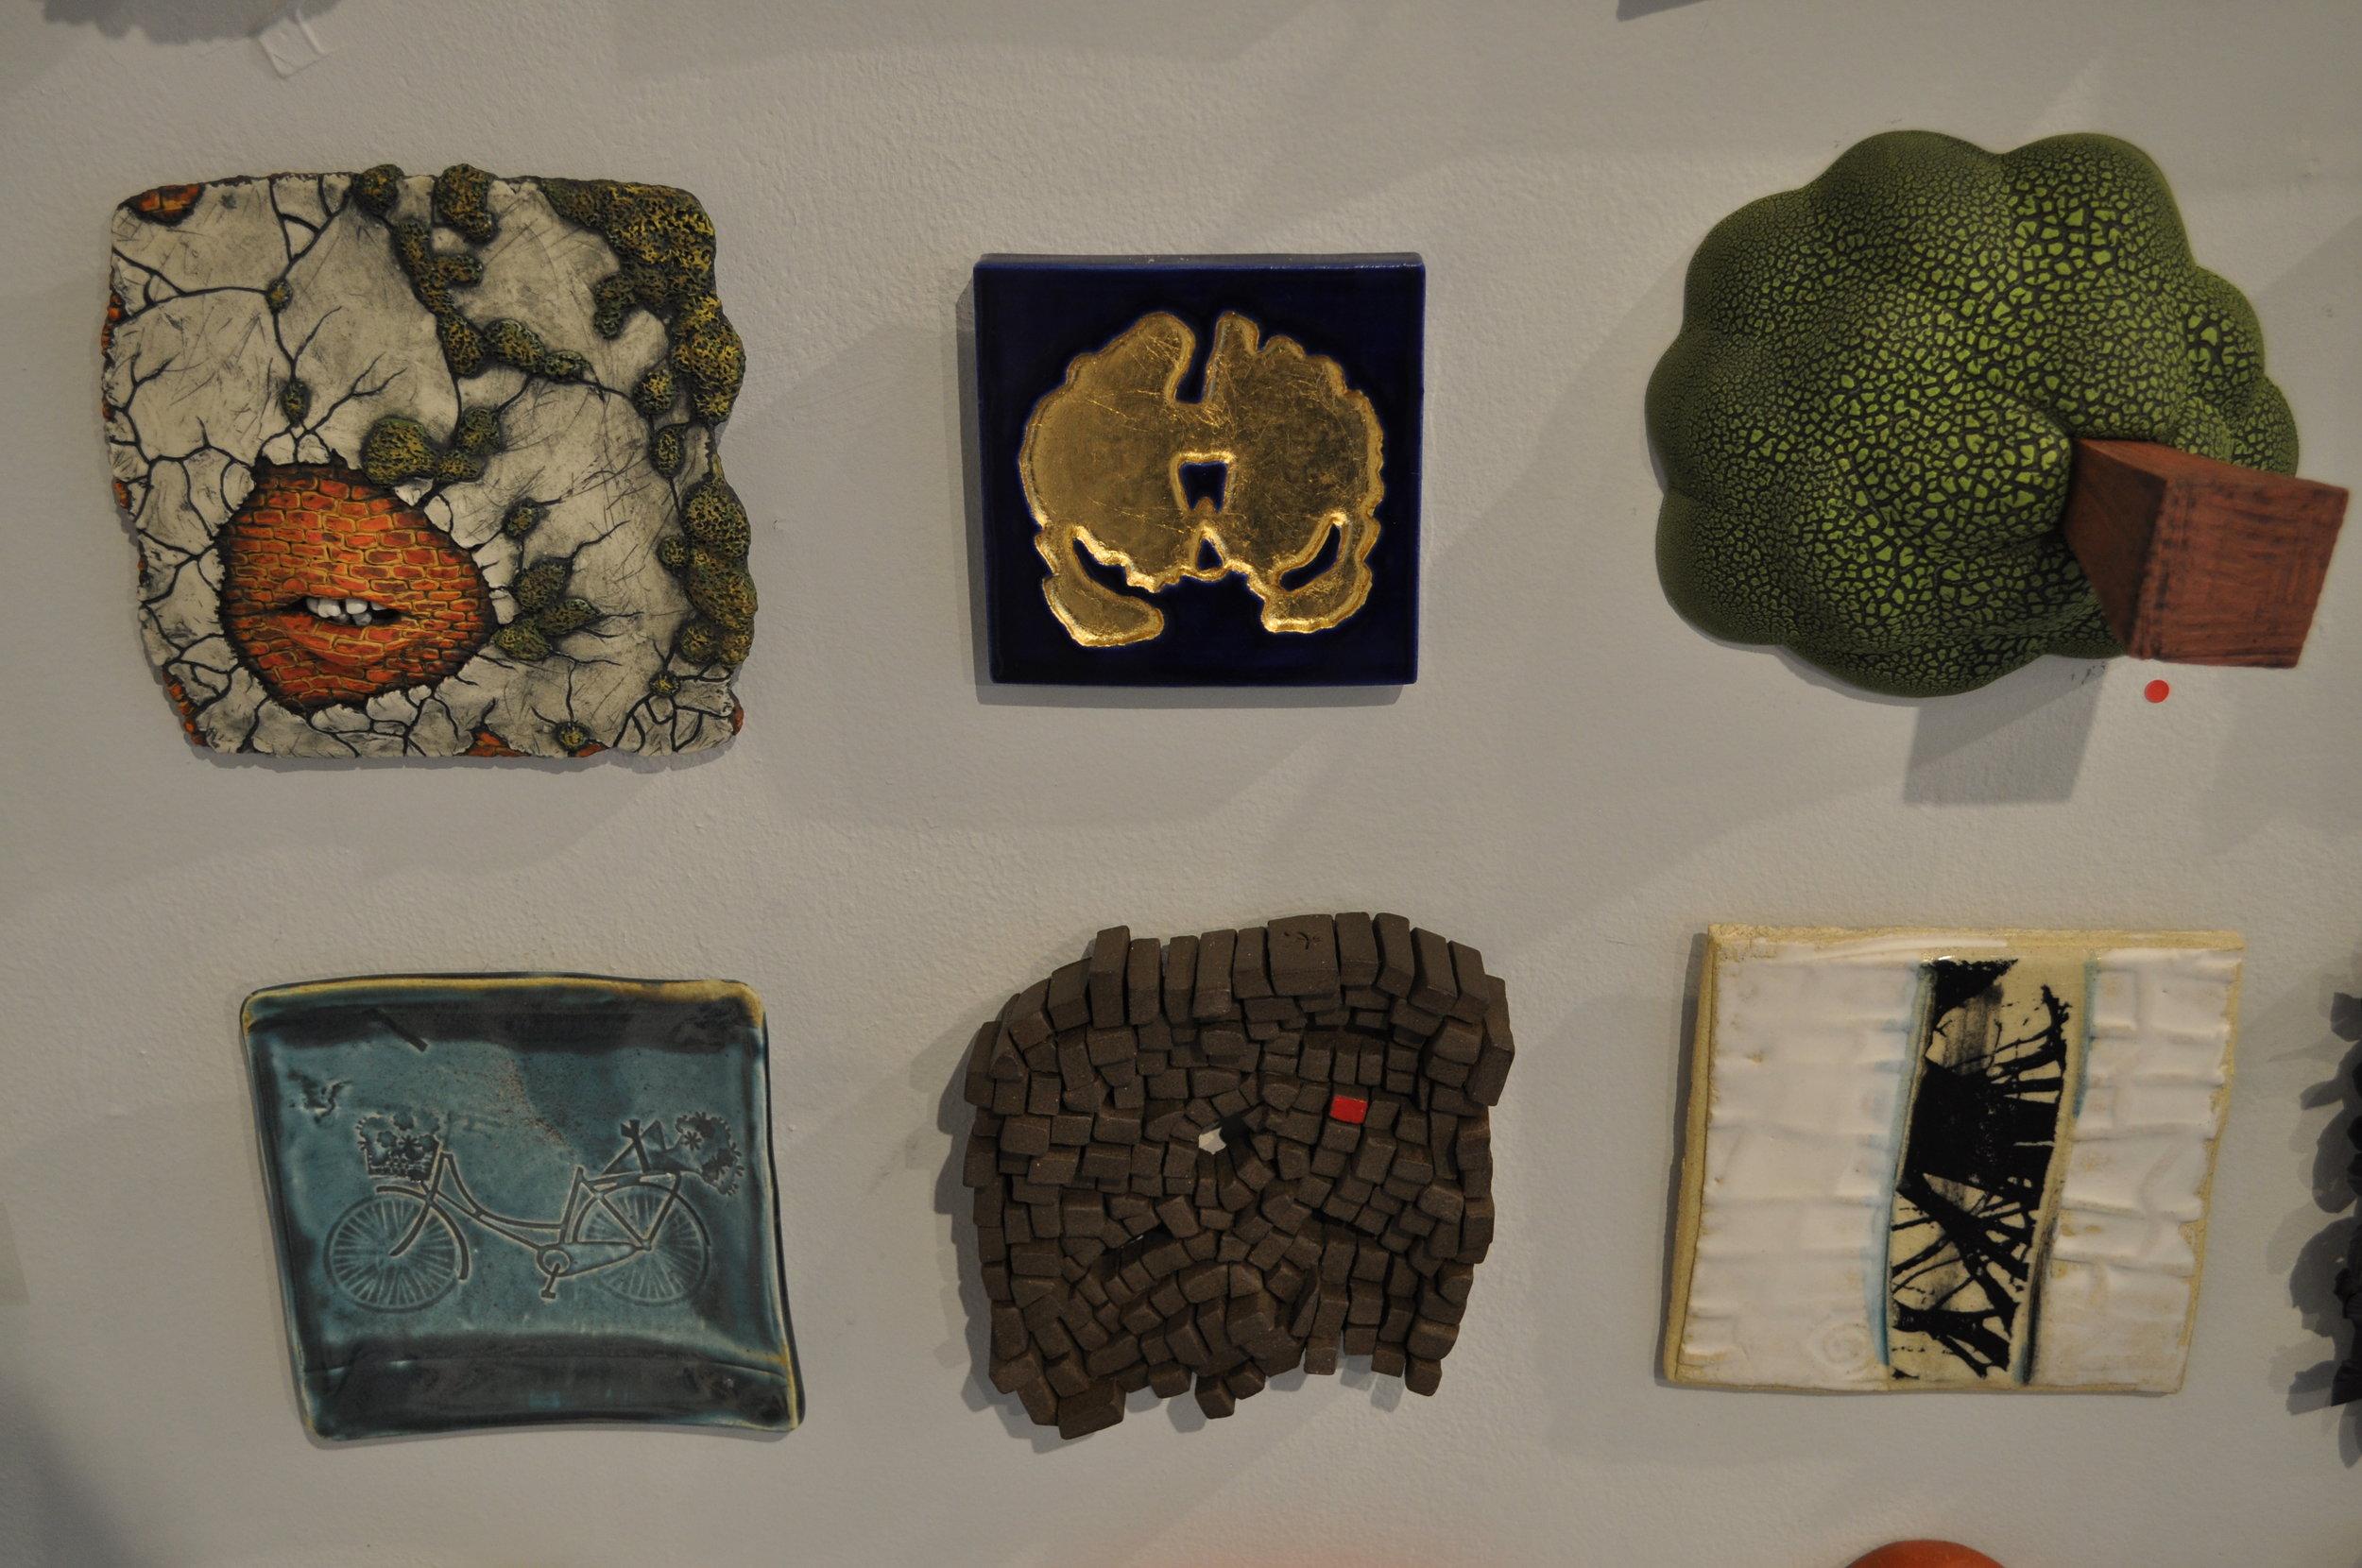 1.  Julie Elkins,  Movement on it's own  $400  2.  Bri Murphy,  Coronal Slice Geode Tile (Blue-Edition 2 of 3)  $200  3 . Jonathan McMillan,  Untitled  (SOLD)  4. Robin Henschel,  Spring jaunt  $50  5.  Harold Silverman,  Vermilion Spot #2  $90  6.  Helayne Friedland,  Branches tile 4  $75